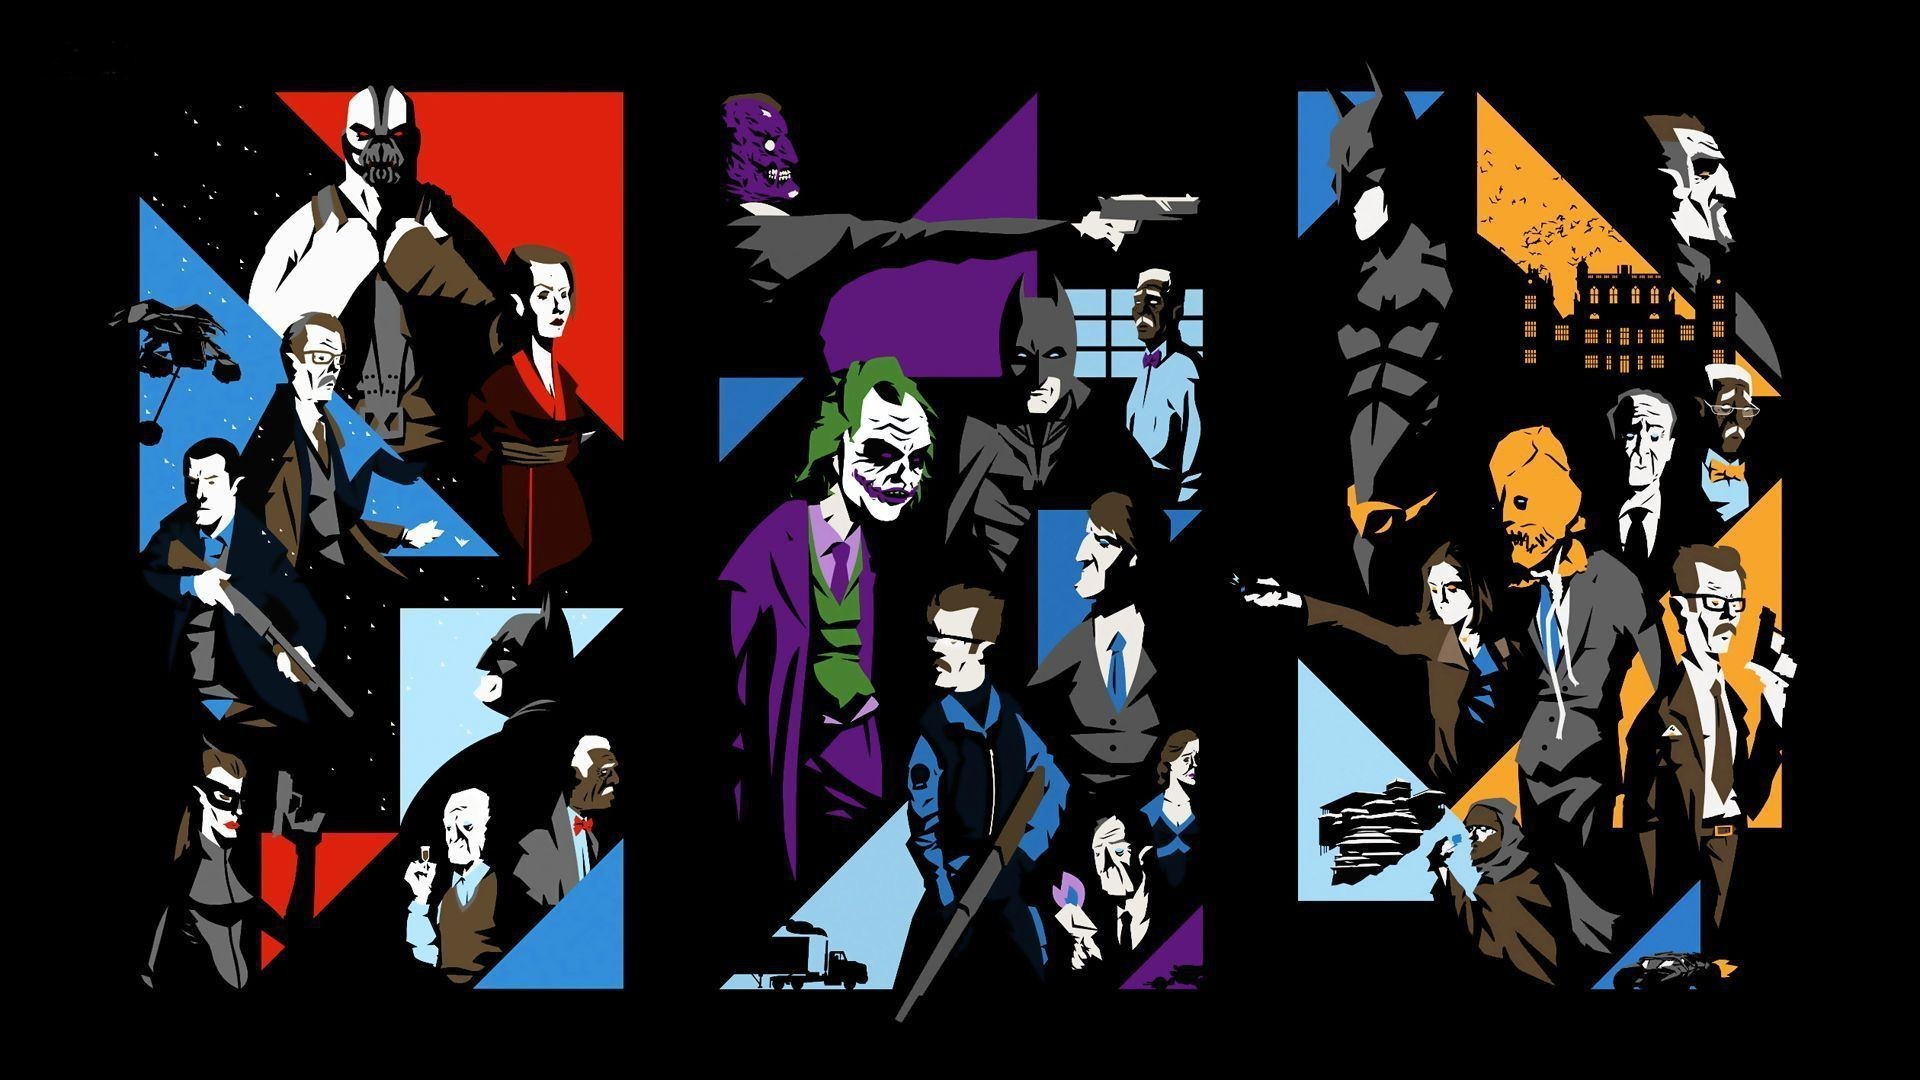 … Catwoman, Batman Begins, The Dark Knight, The Dark Knight Rises, Heath  Ledger, Batman, Joker, Bane, Movies, Video Games Wallpapers HD / Desktop  and …